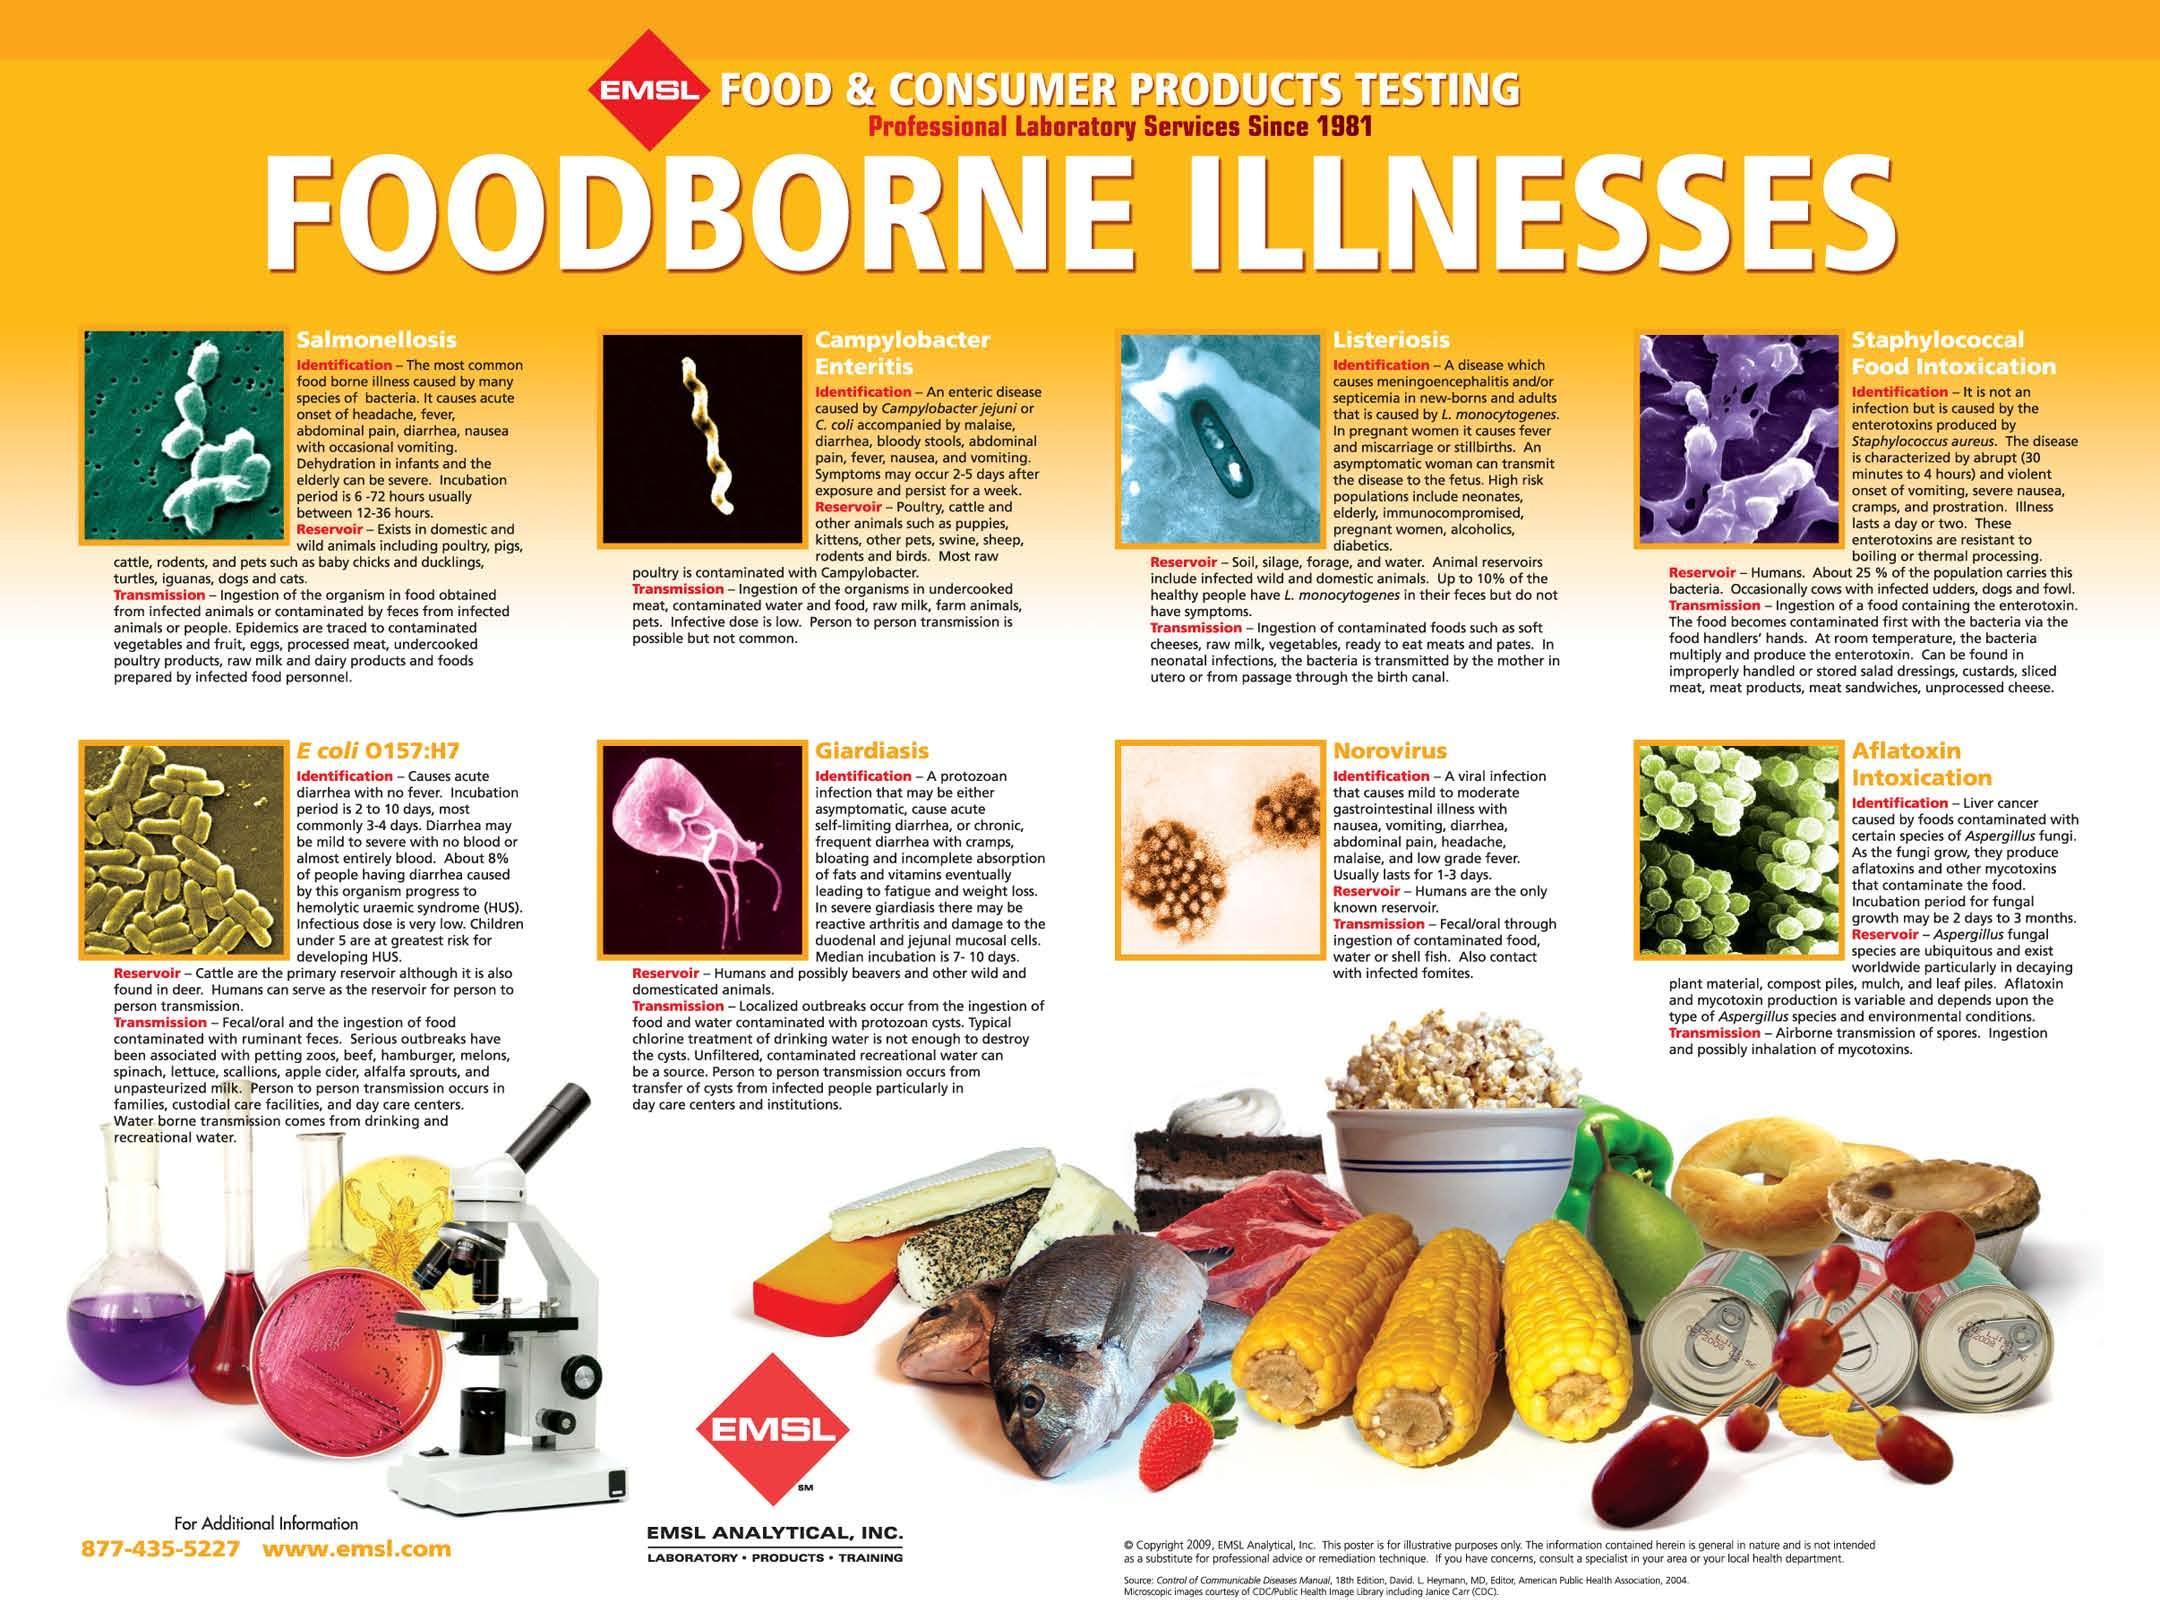 Free Foodborne Illnesses Poster